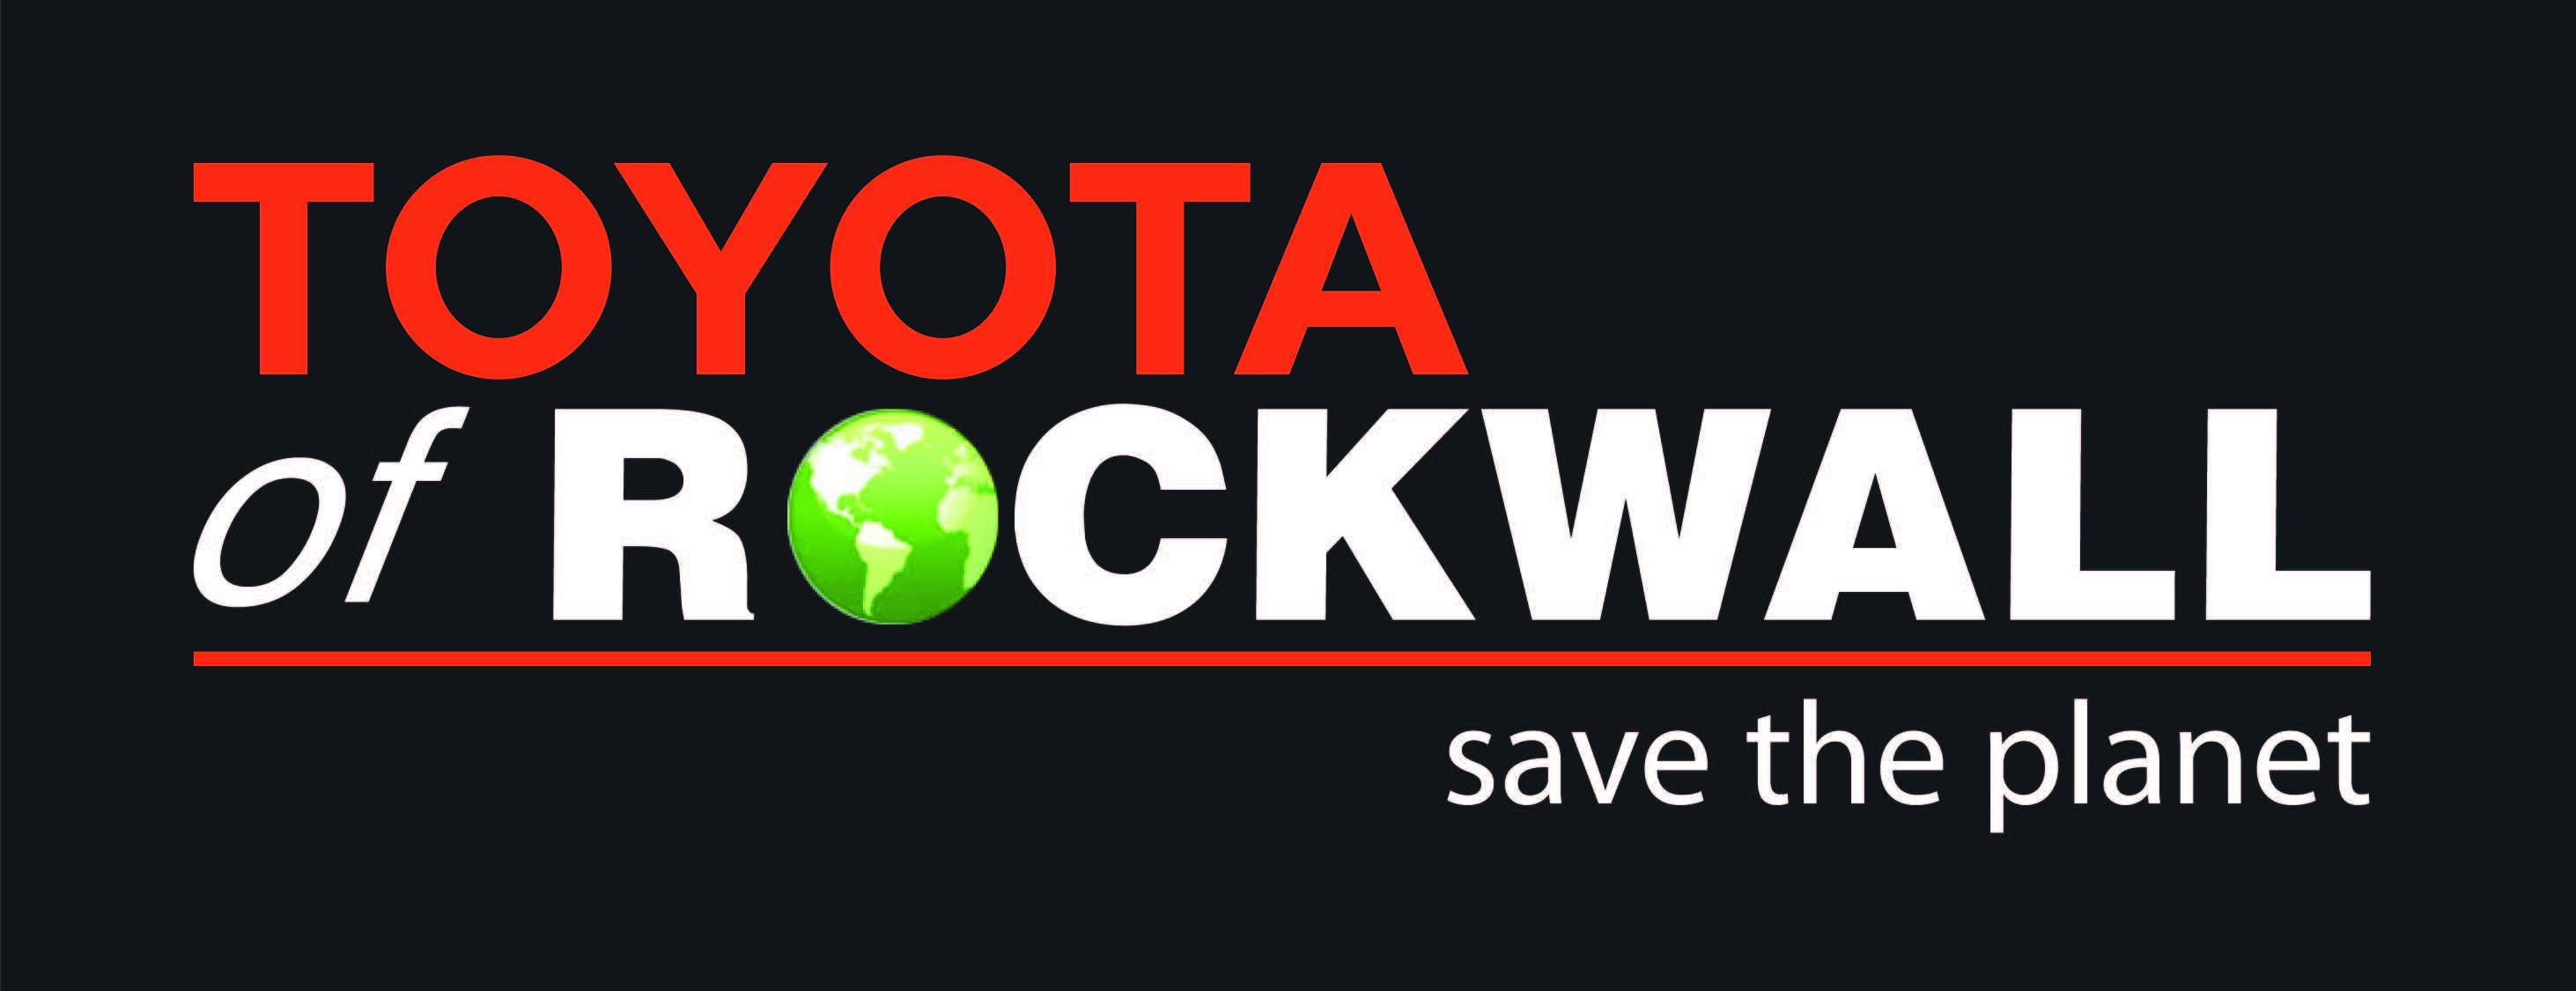 Toyota Of Rockwall >> Car Raffle This Friday At Toyota Of Rockwall Blue Ribbon News